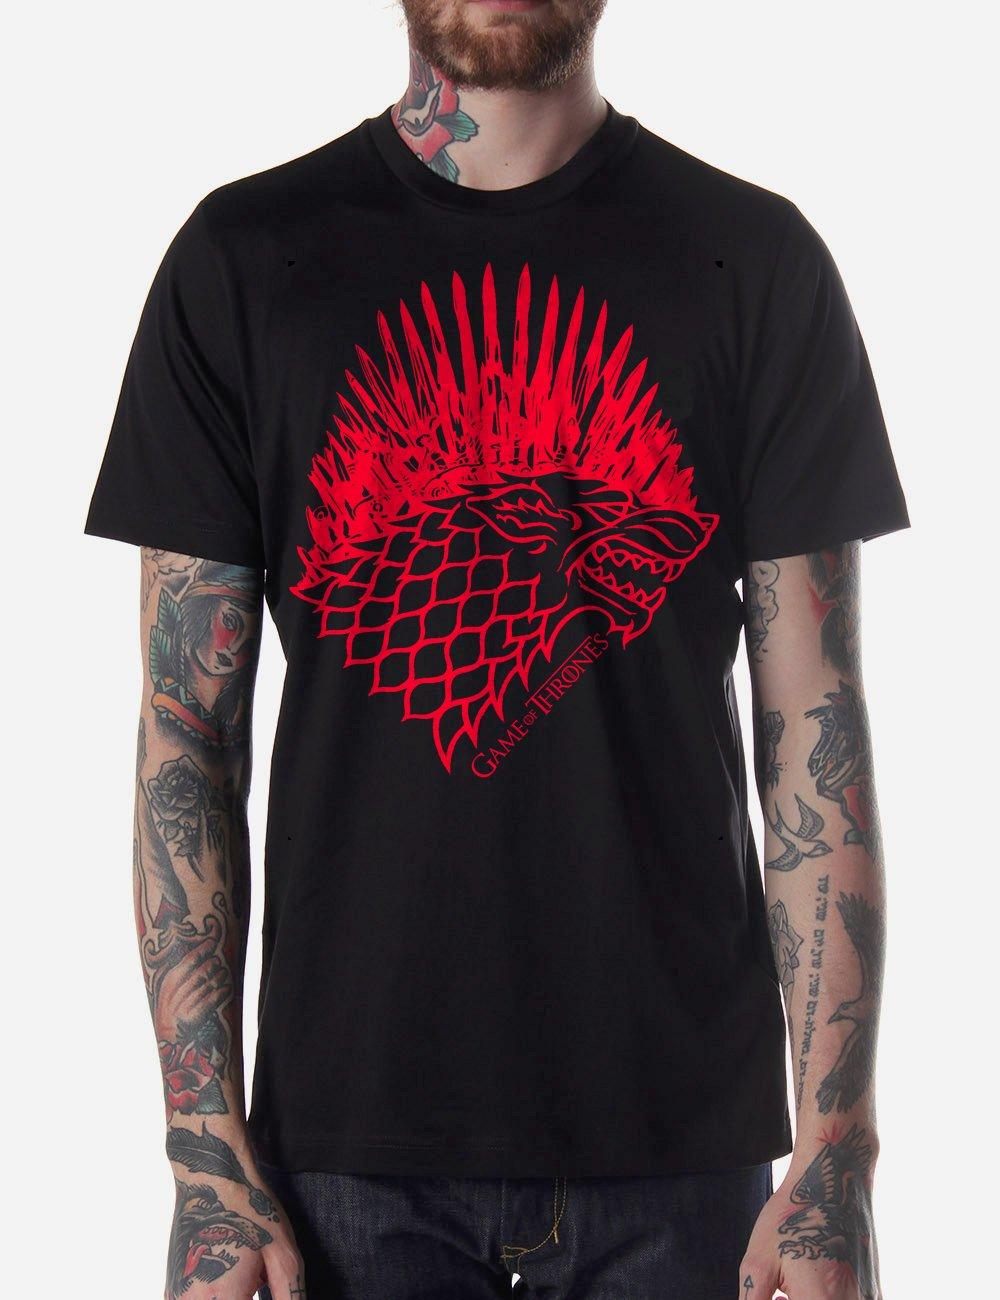 Black Men Tshirt Game Of Thrones Winter Coming Black Tshirt For Men